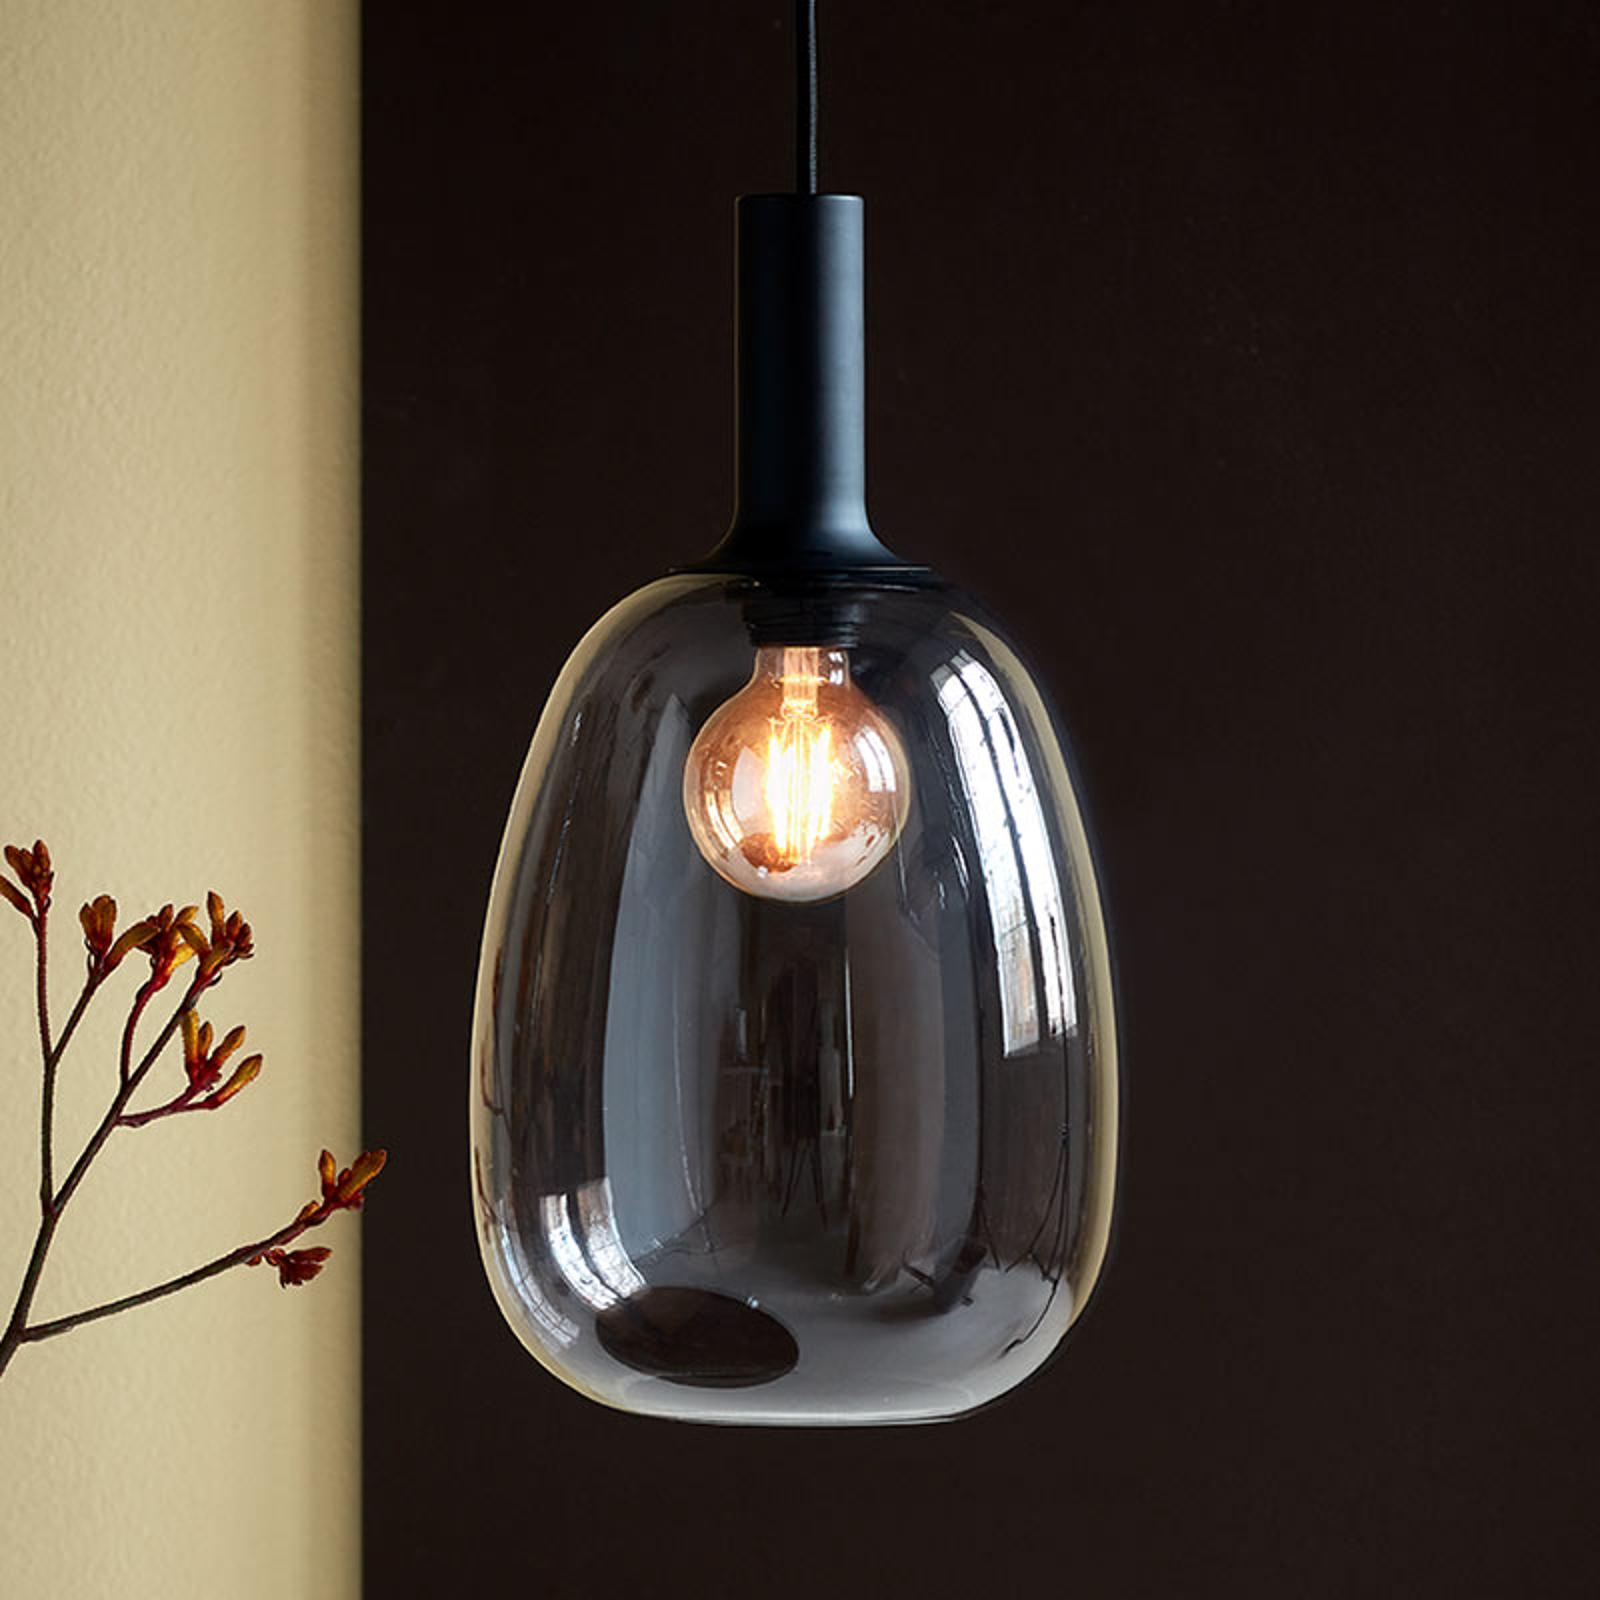 Hanglamp Alton met glazen kap rookgrijs Ø 23cm